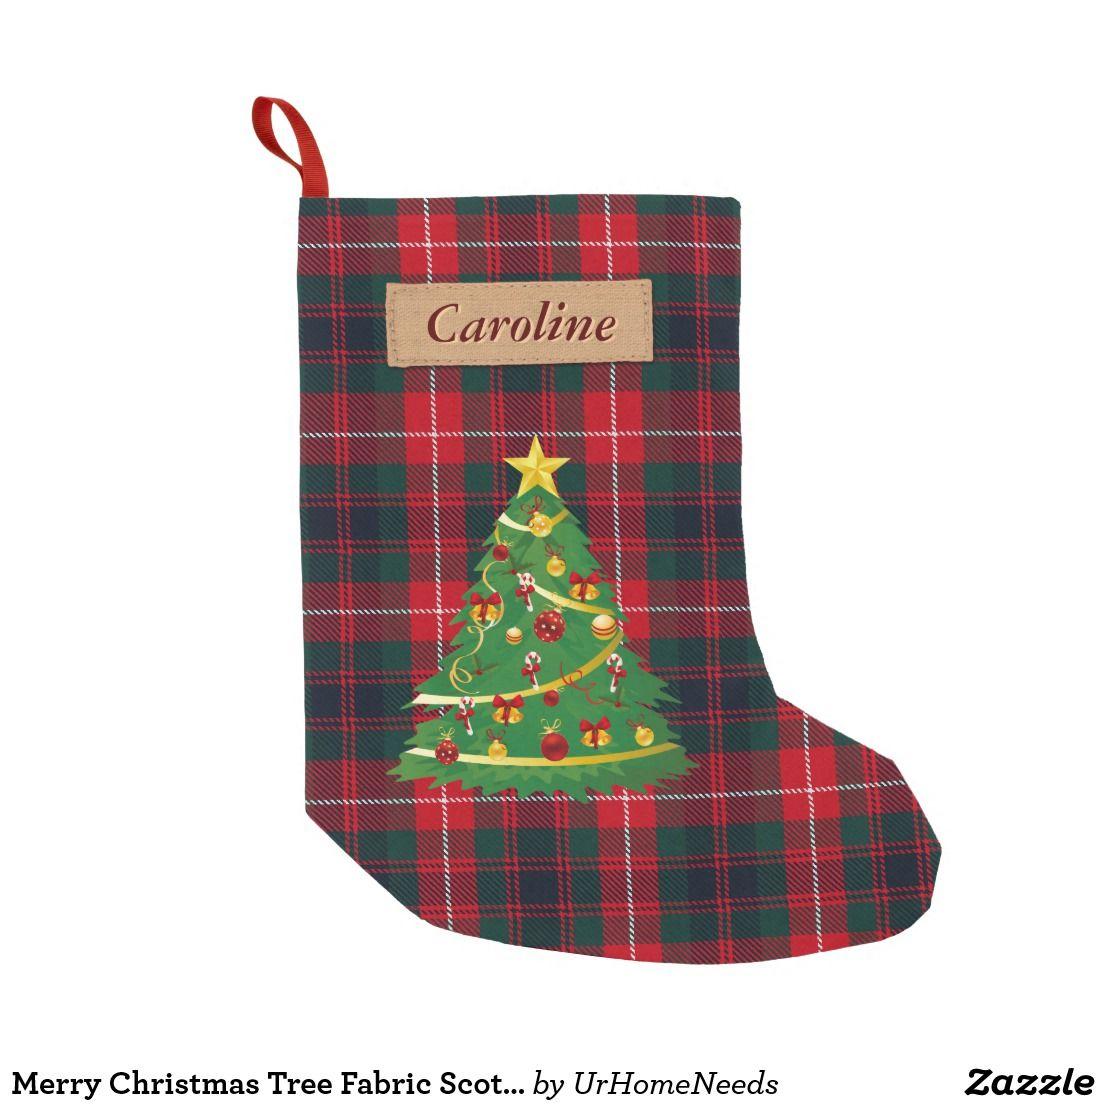 Merry Christmas Tree Fabric Scottish Plaid Tartan Small Christmas ...